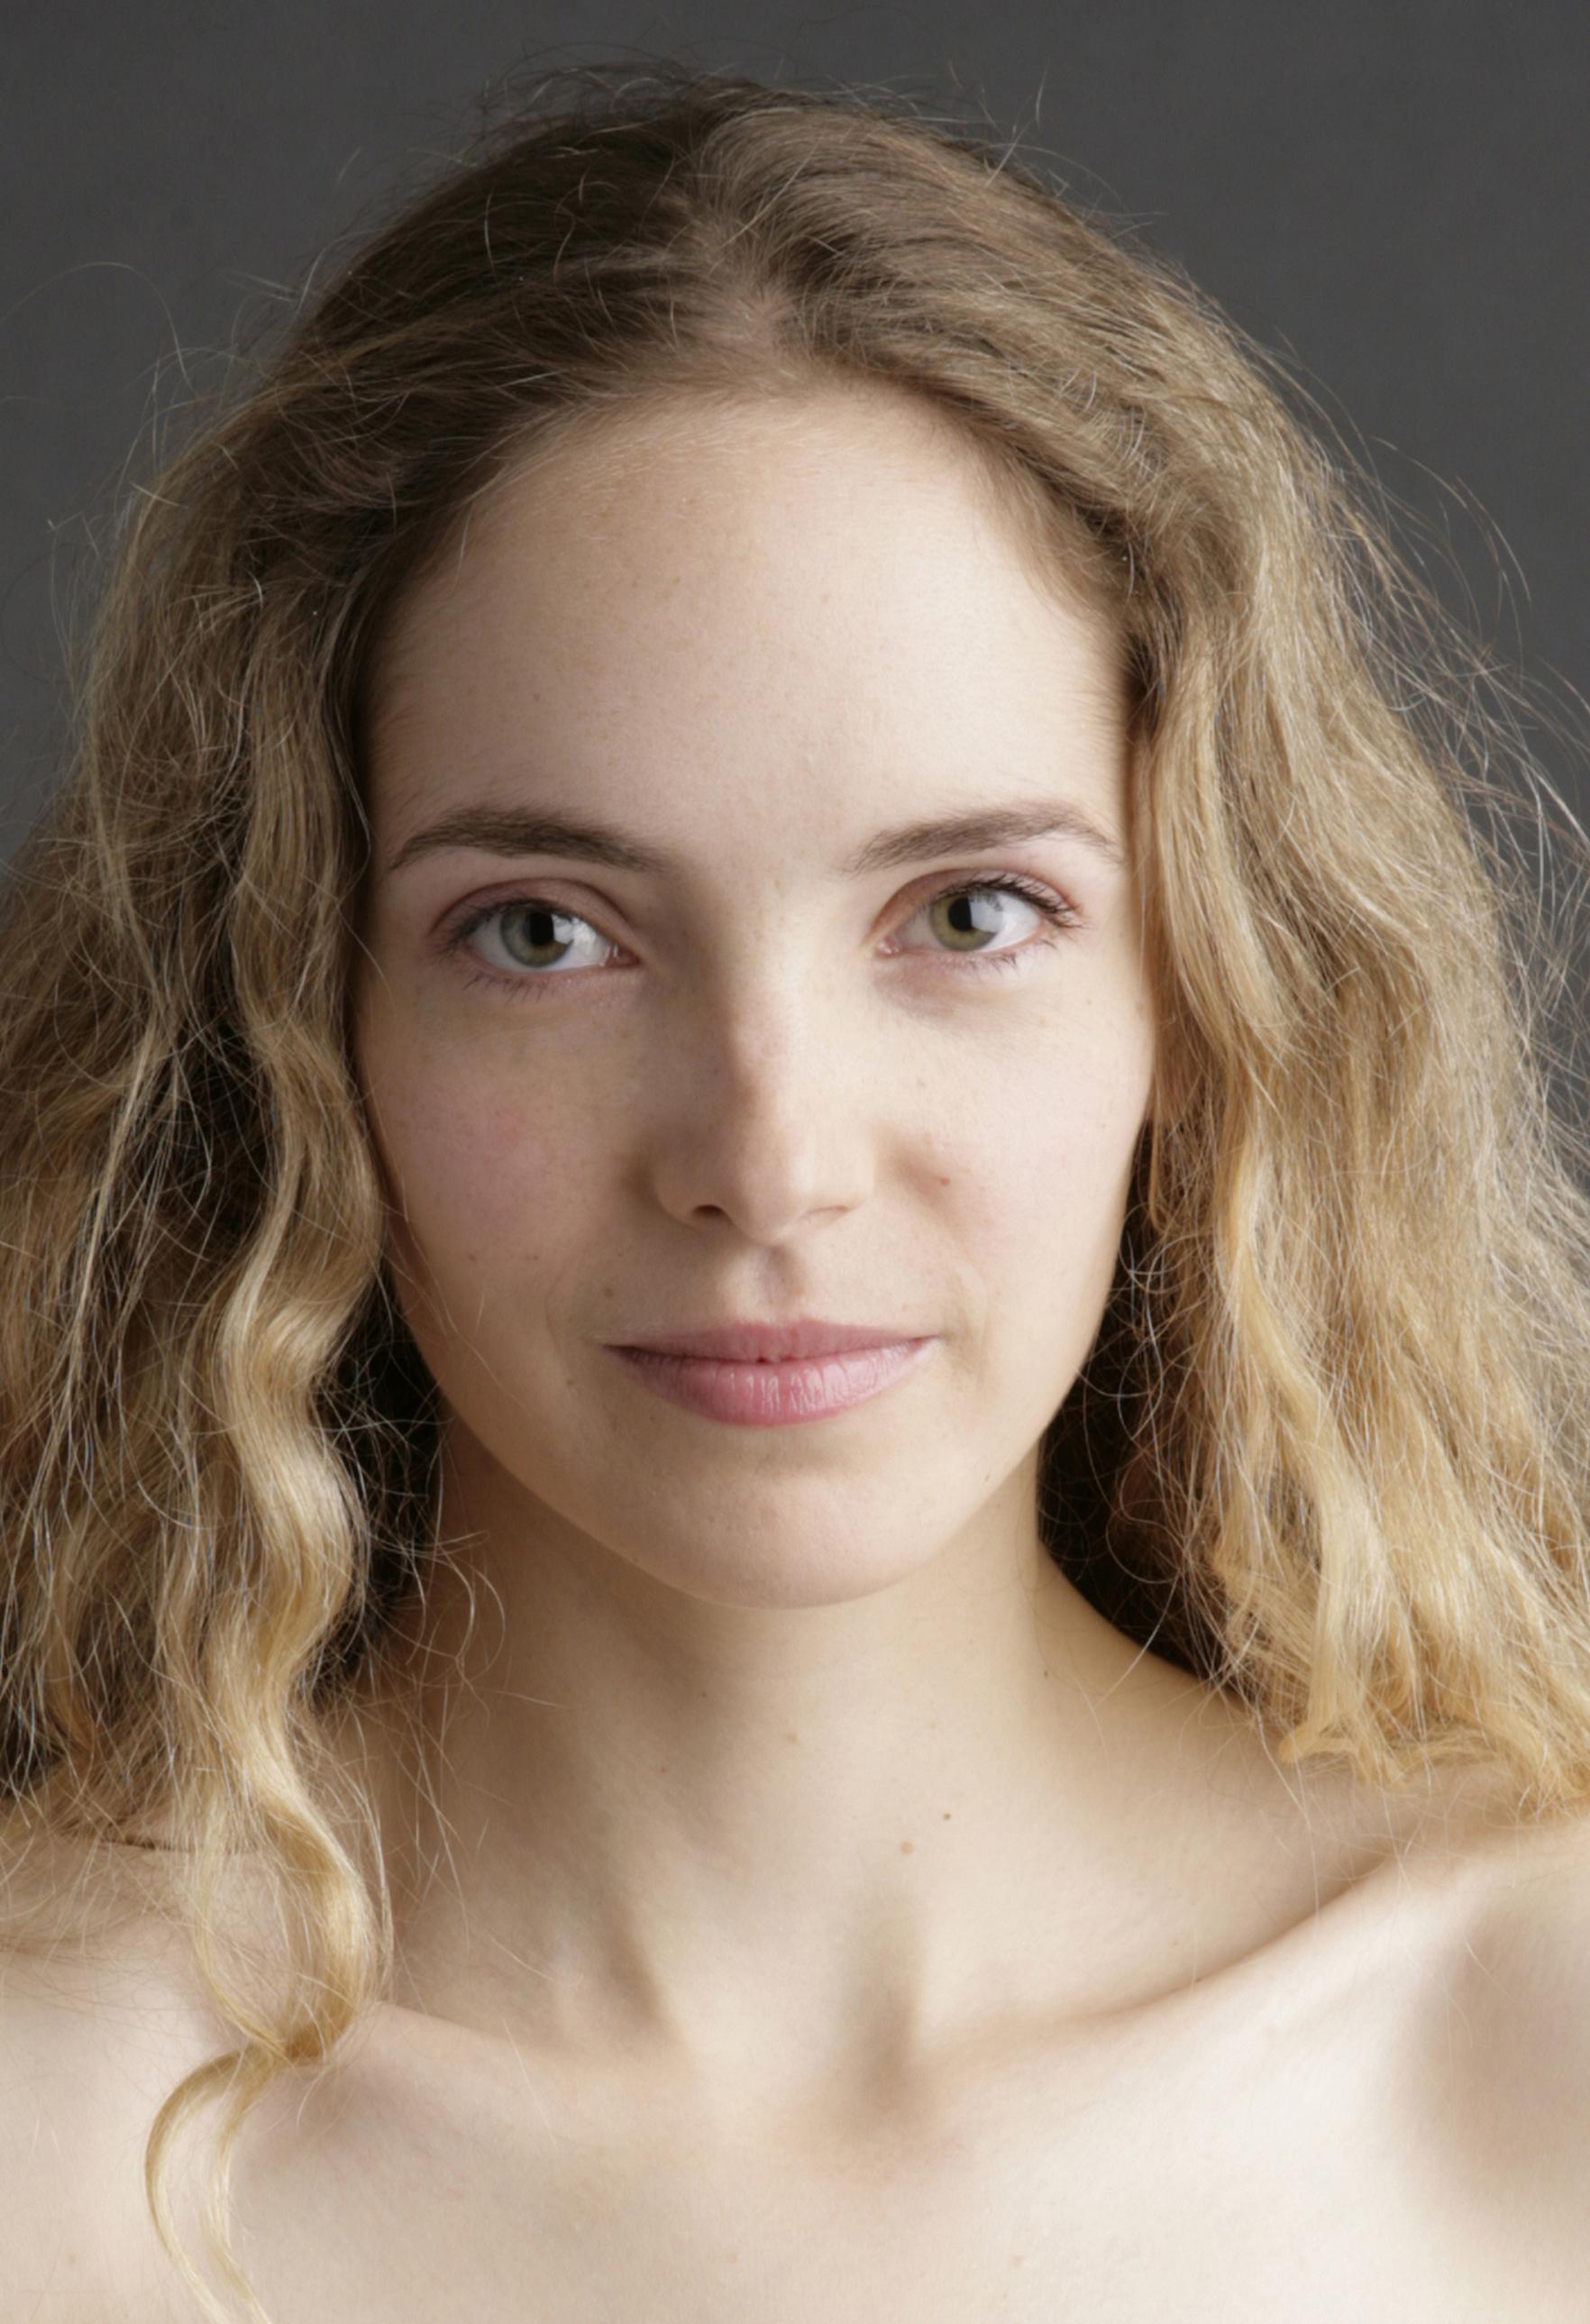 Laura Weissbecker - Wikipedia, the free encyclopedia